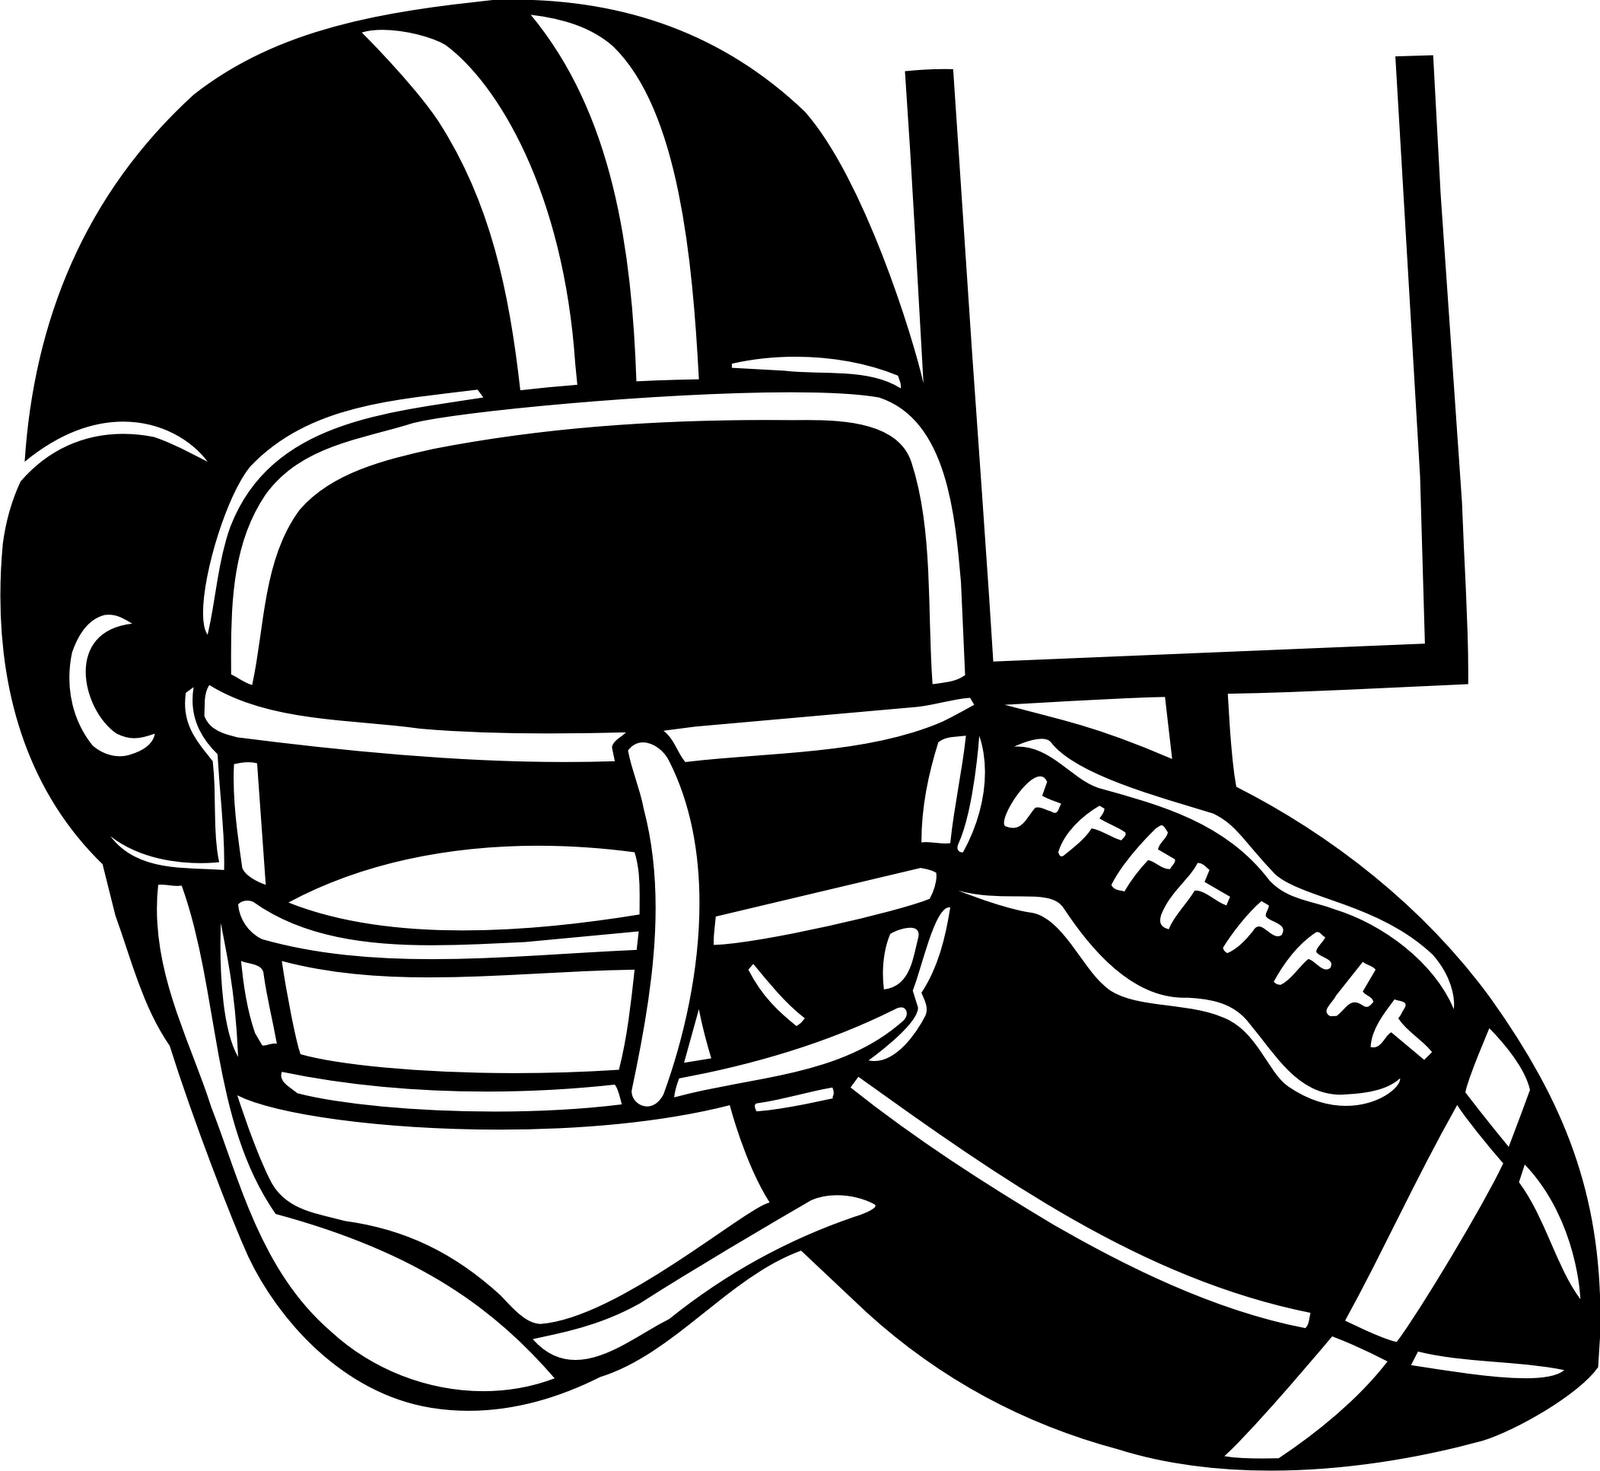 Free Football Clip Art, Download Free Clip Art, Free Clip Art on.